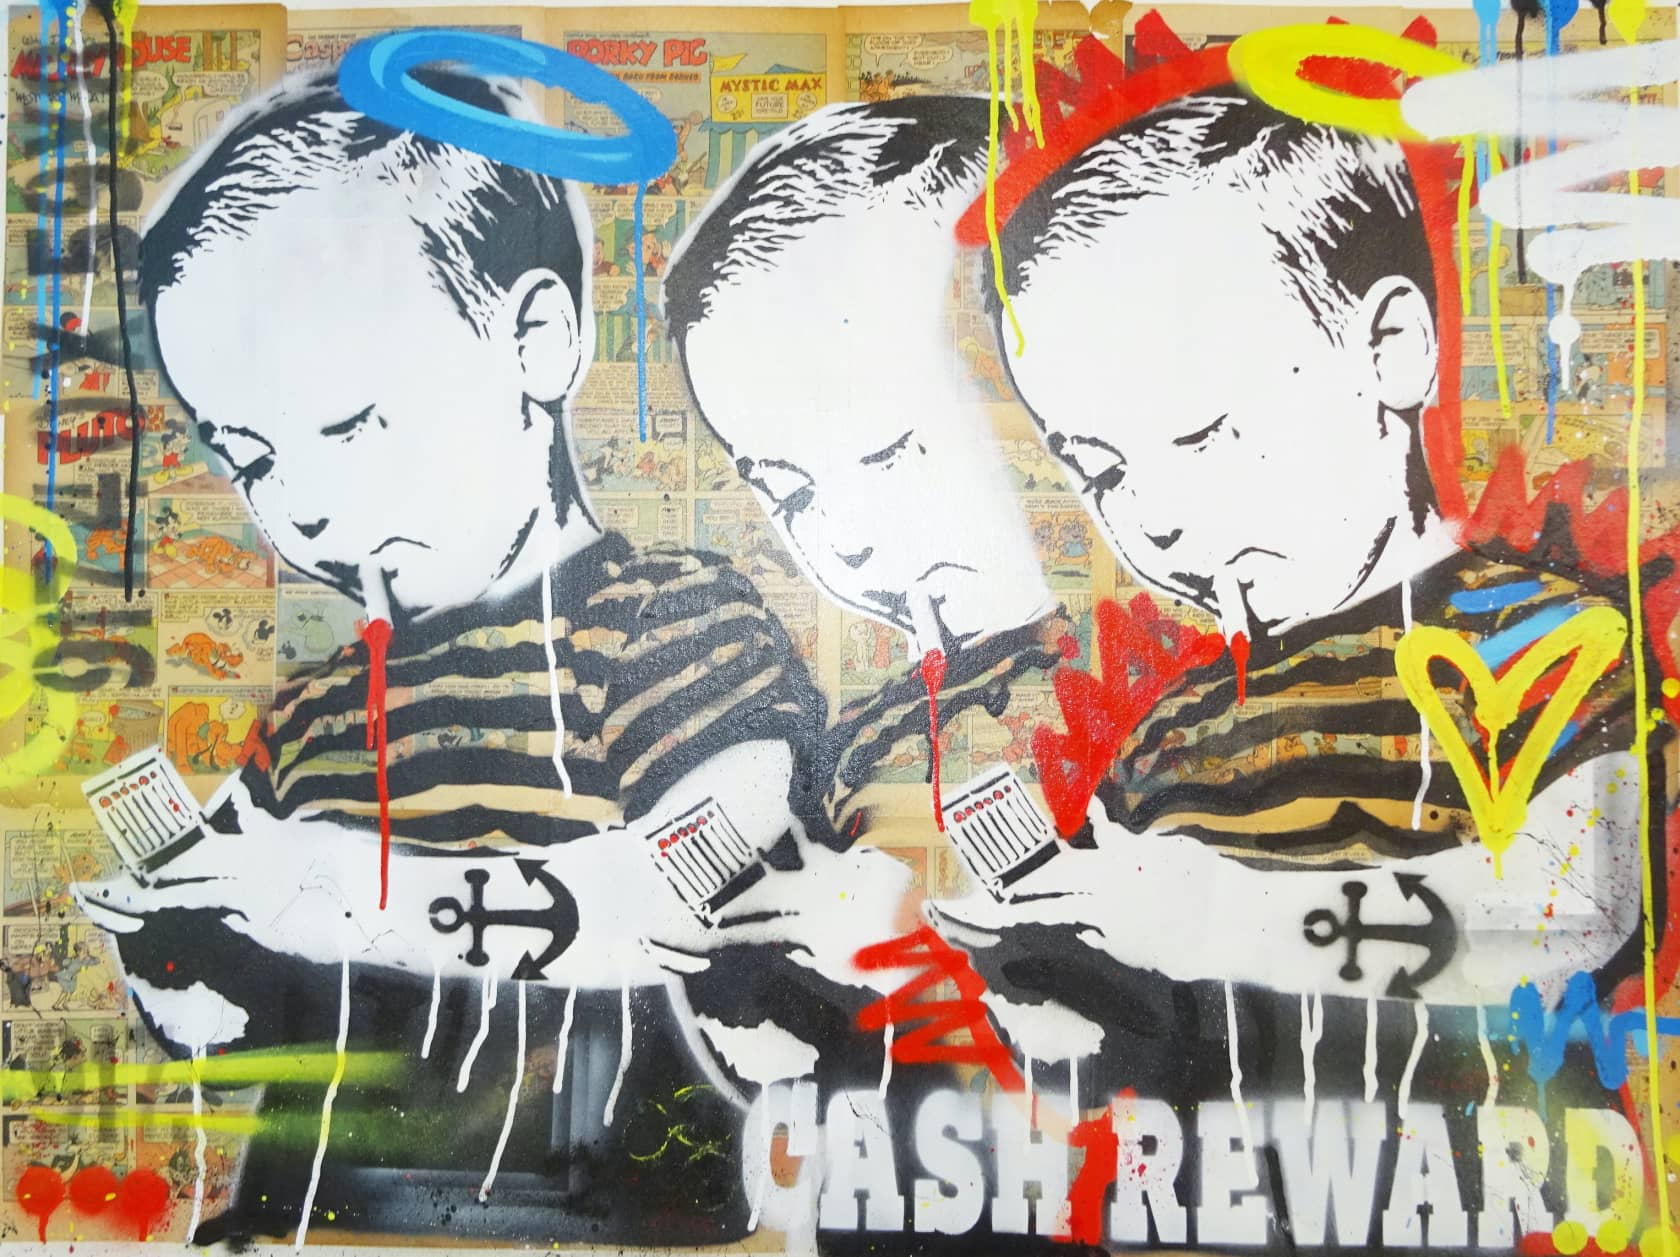 Layer Cake, Triplets Cash Reward, 2016